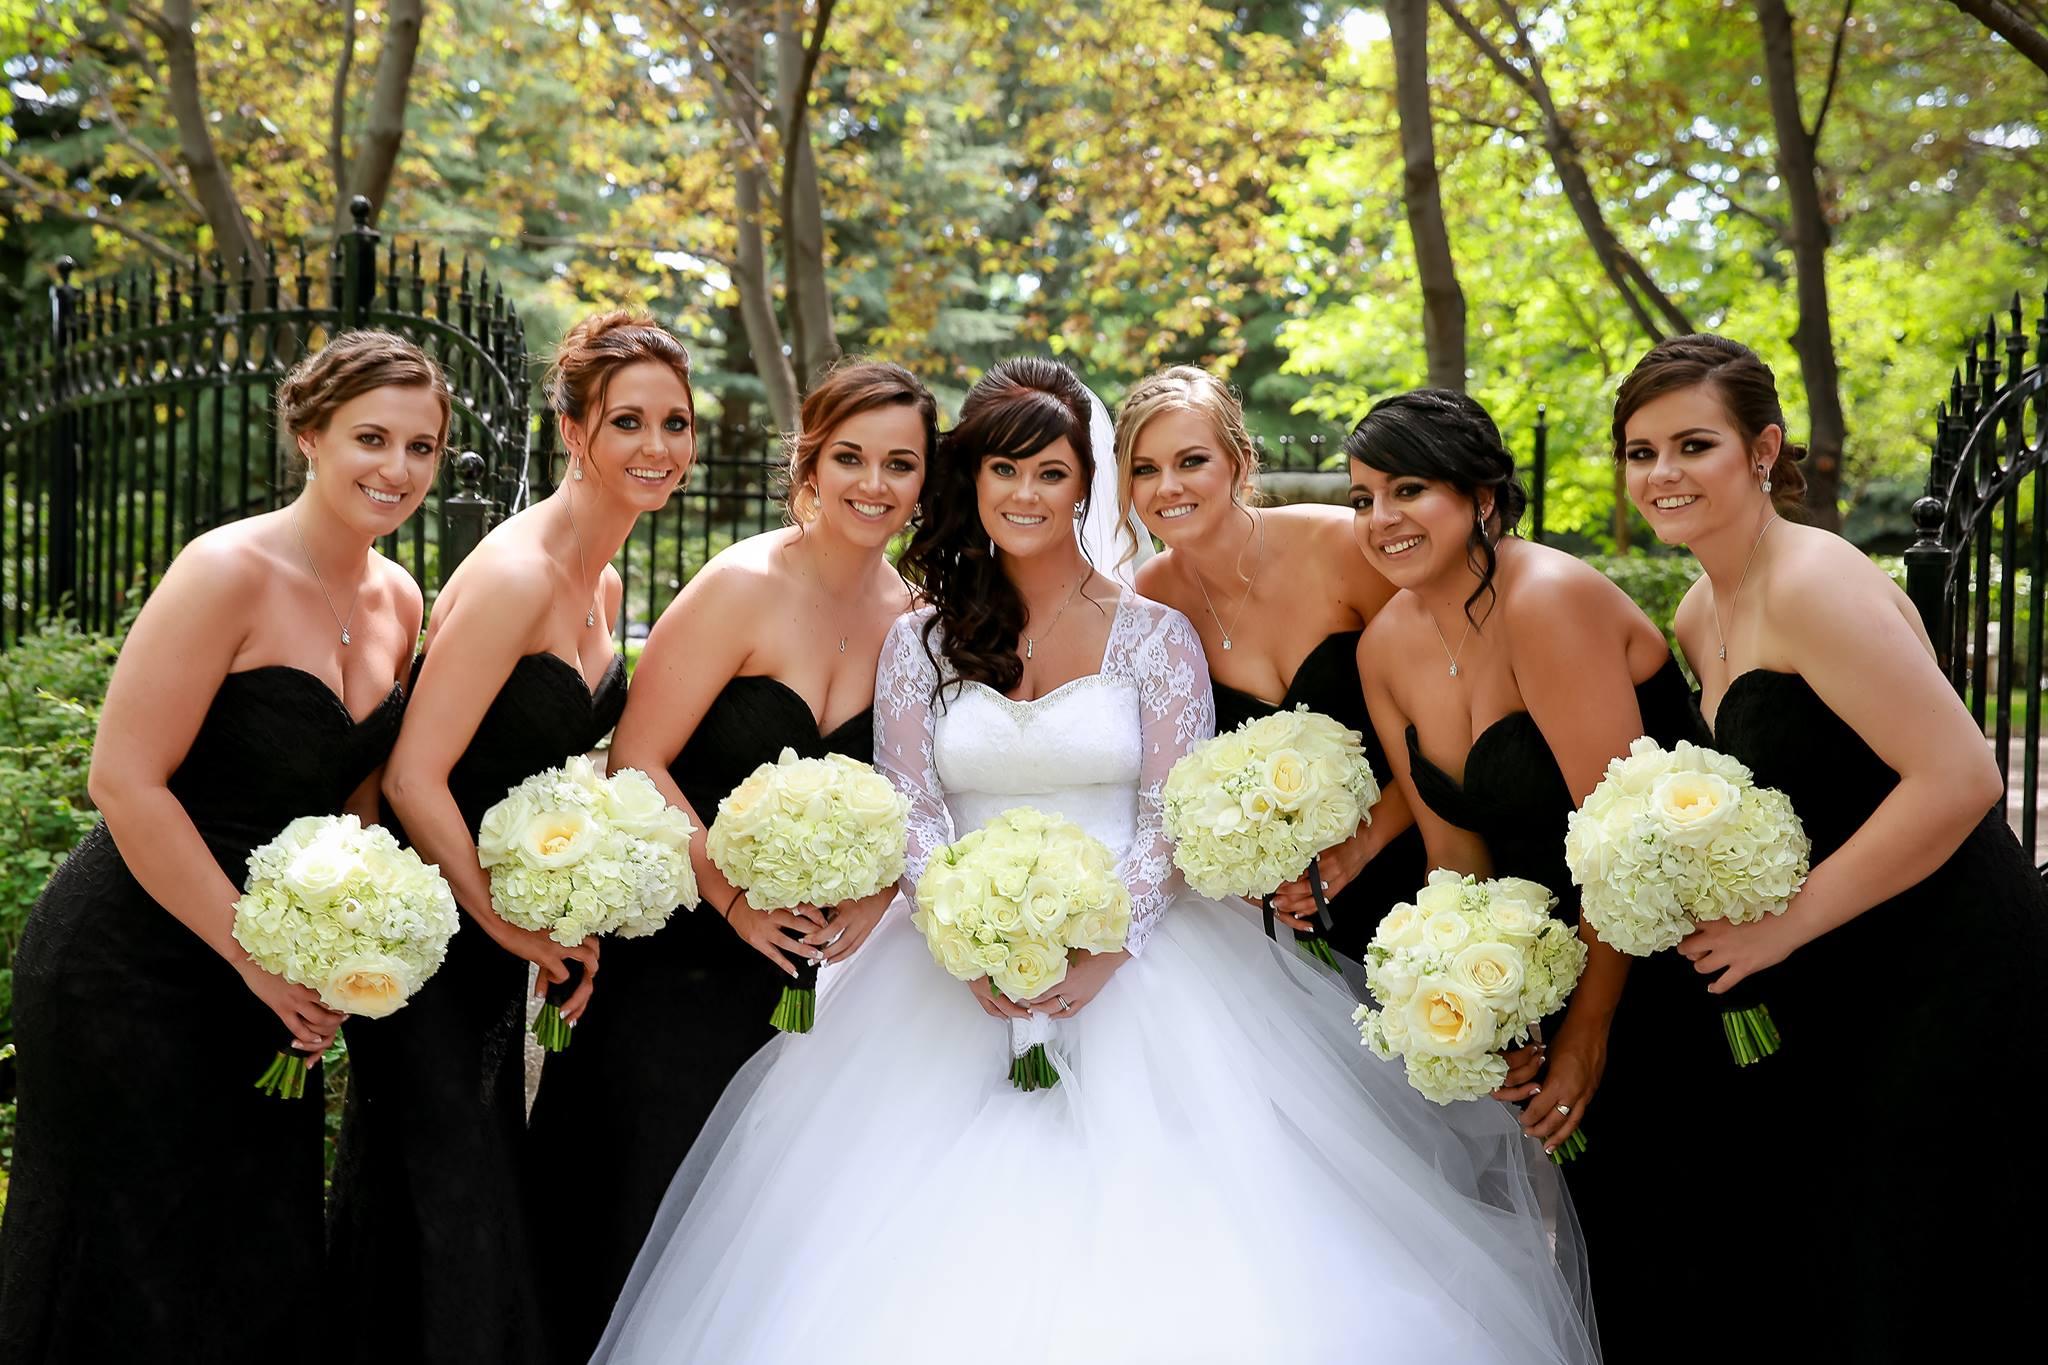 Ally's bridal party-makeup Monika ;hair Jamie